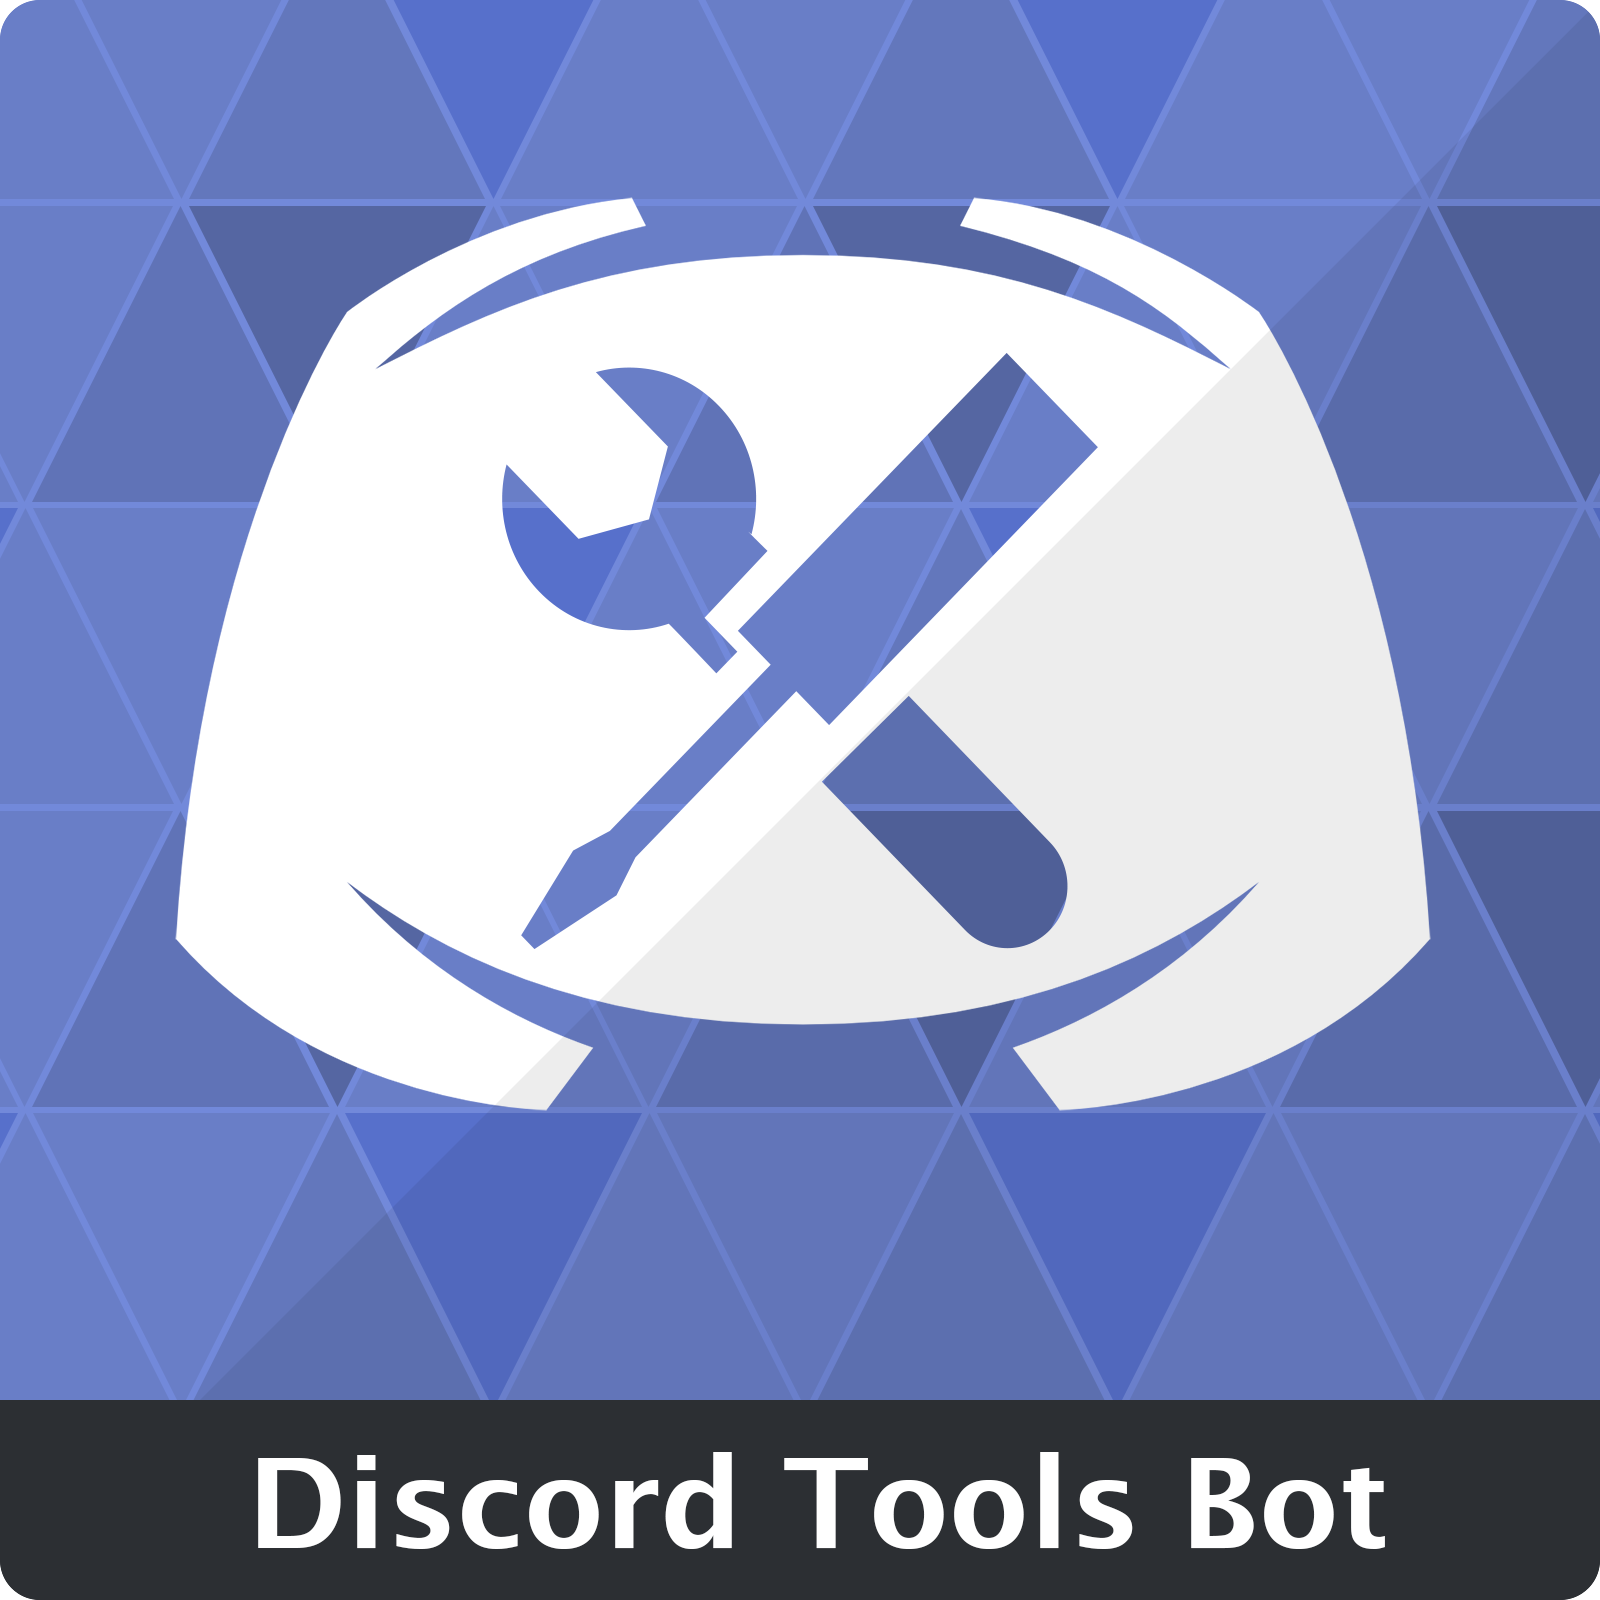 Discord Tools Bot